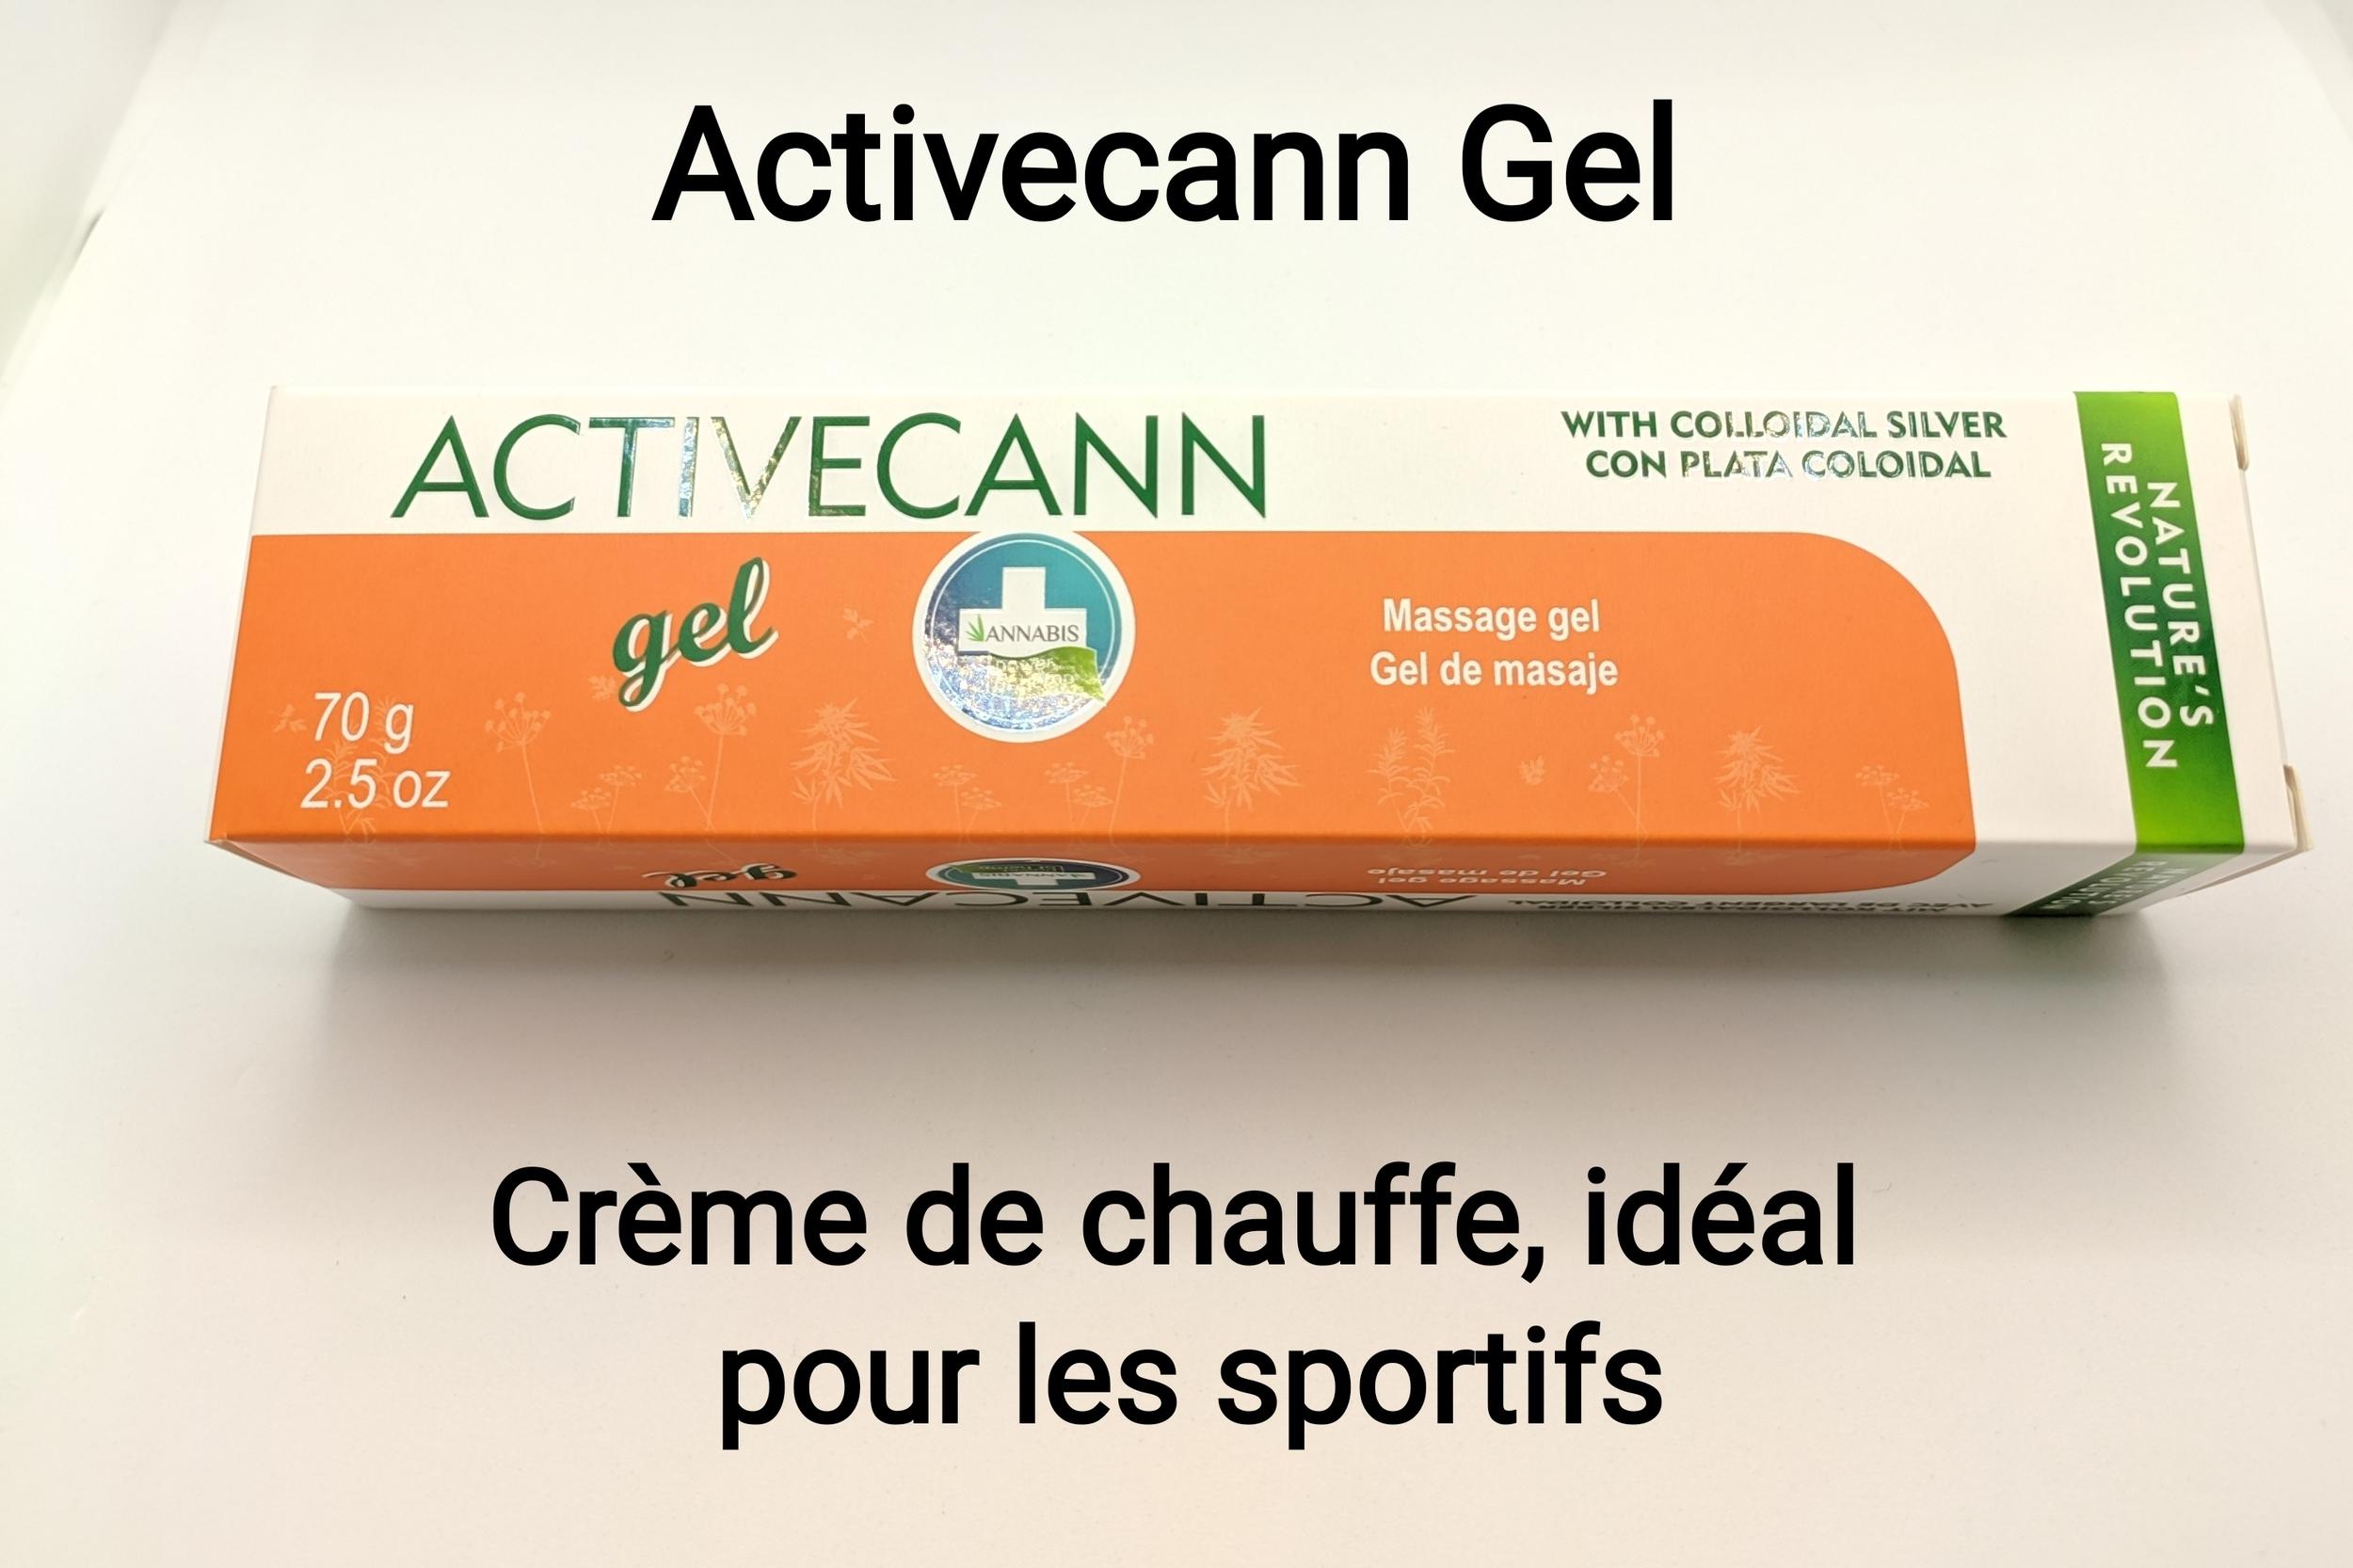 Activecann gel-chauffe